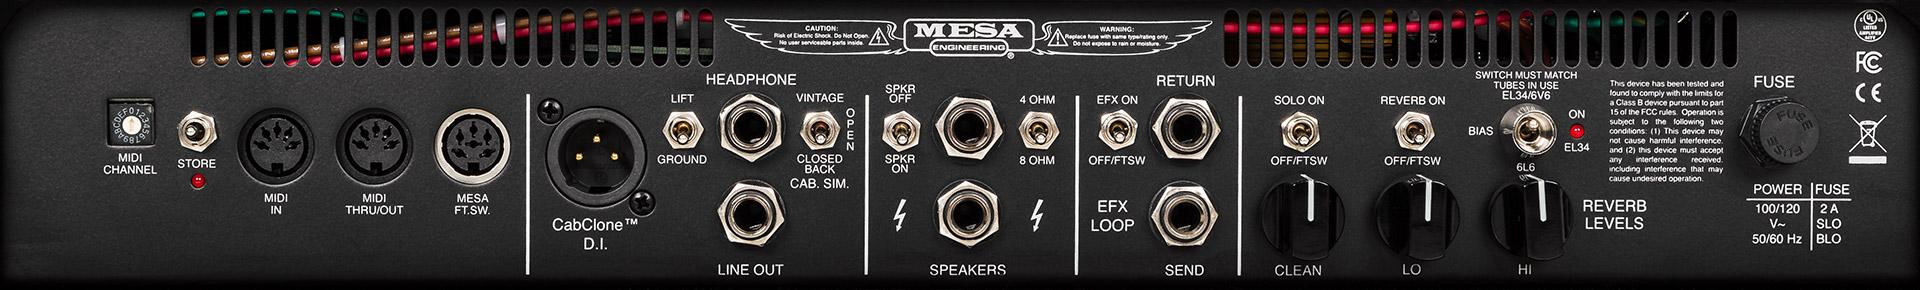 Mesa Boogie Triple Crown TC-50 Guitar Amplifier   MESA/Boogie®